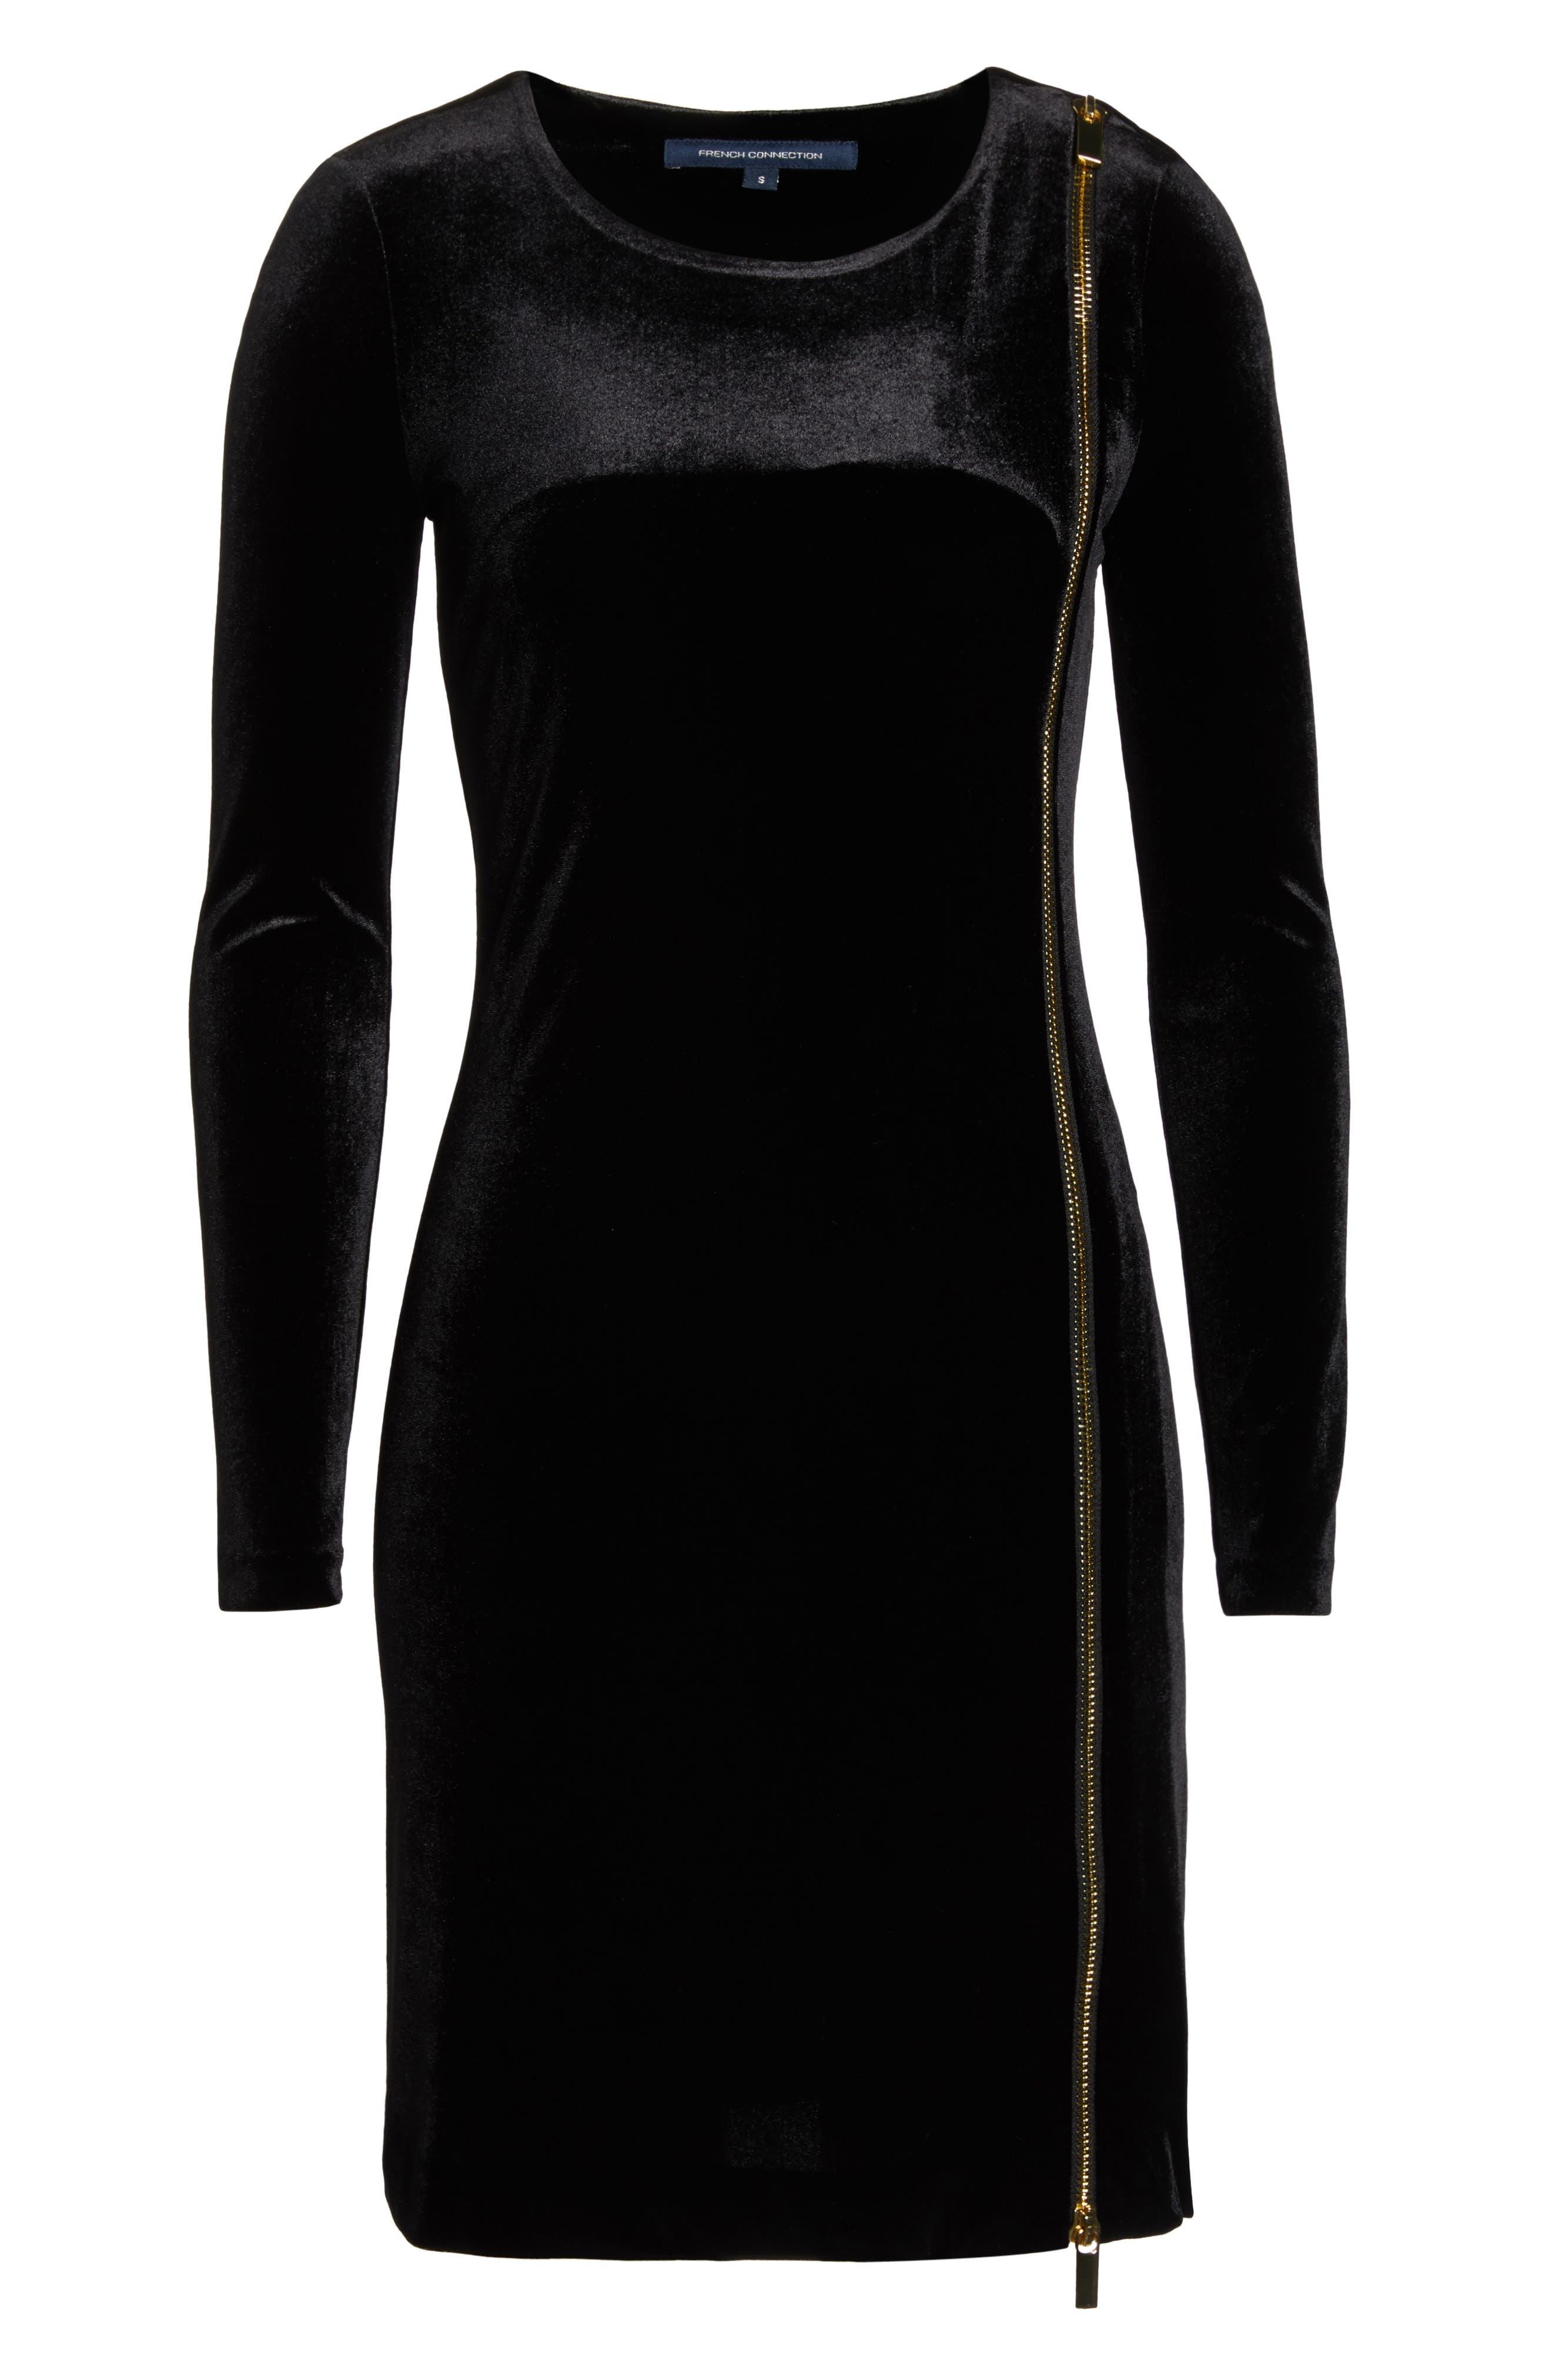 Zella Aurore Velvet Jersey Sheath Dress,                             Alternate thumbnail 7, color,                             BLACK GOLD